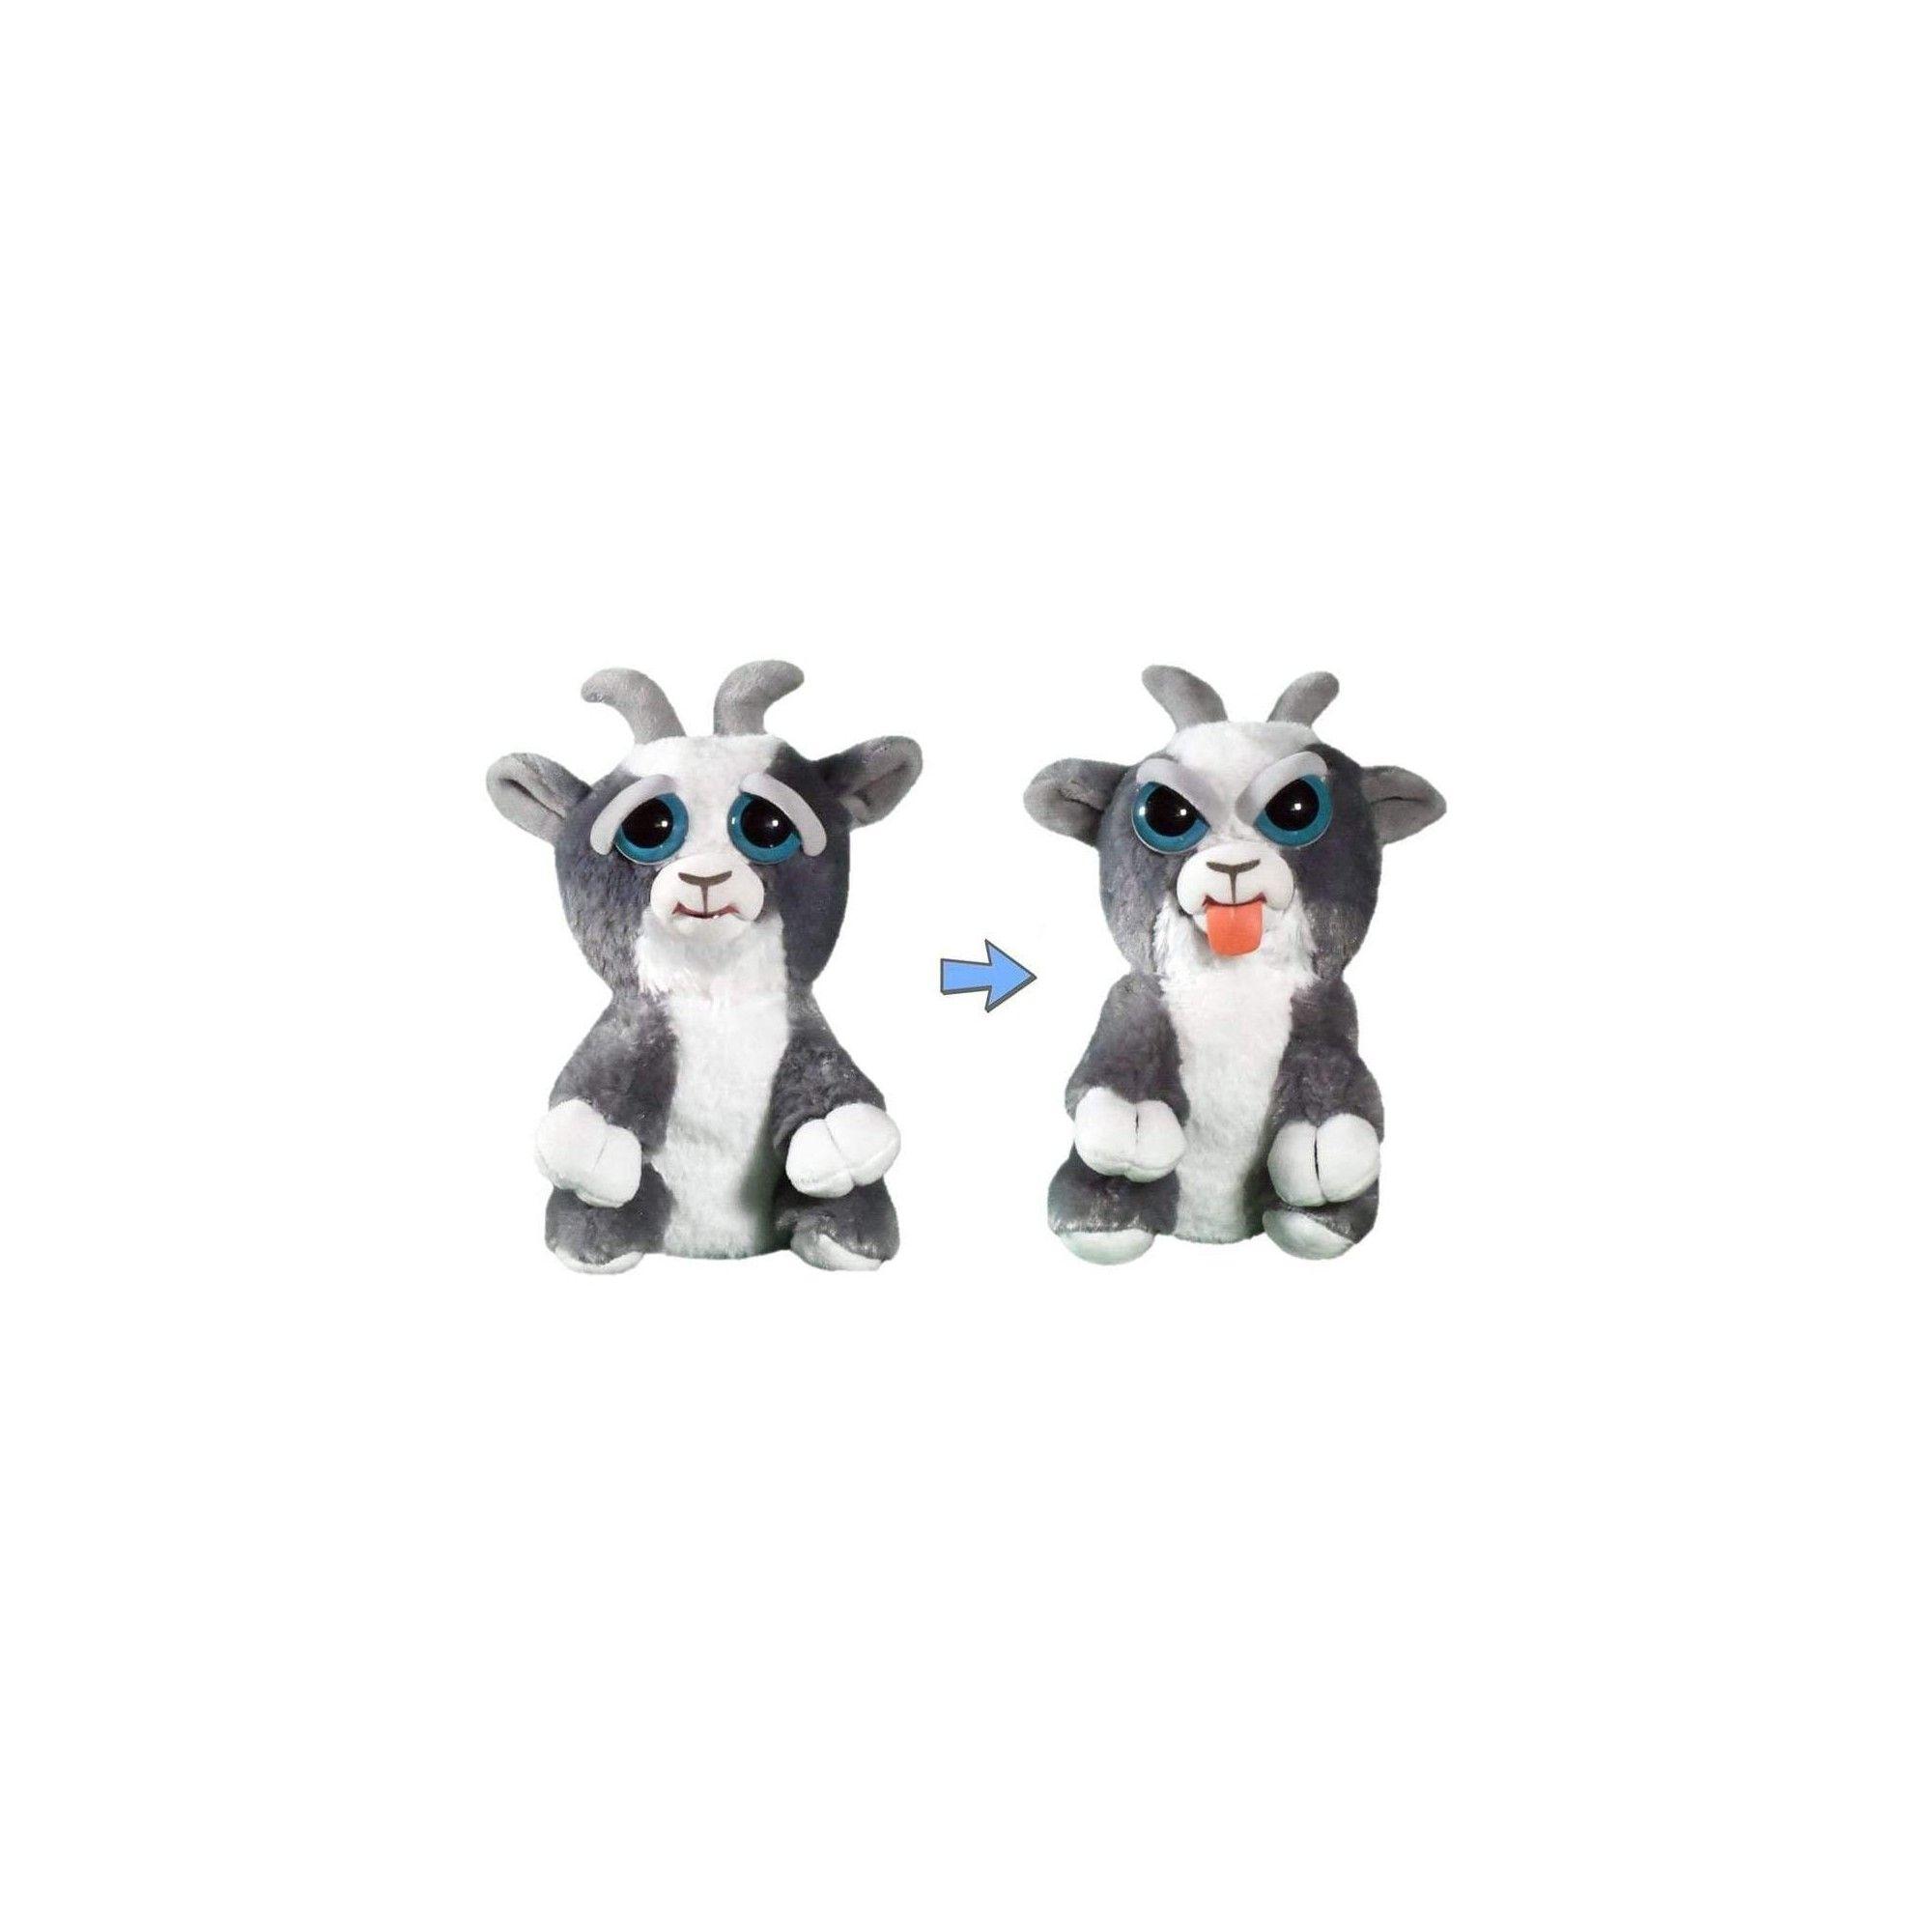 William Mark Corp Feisty Pets Plush Junkyard Jeff Goat Tongue Out